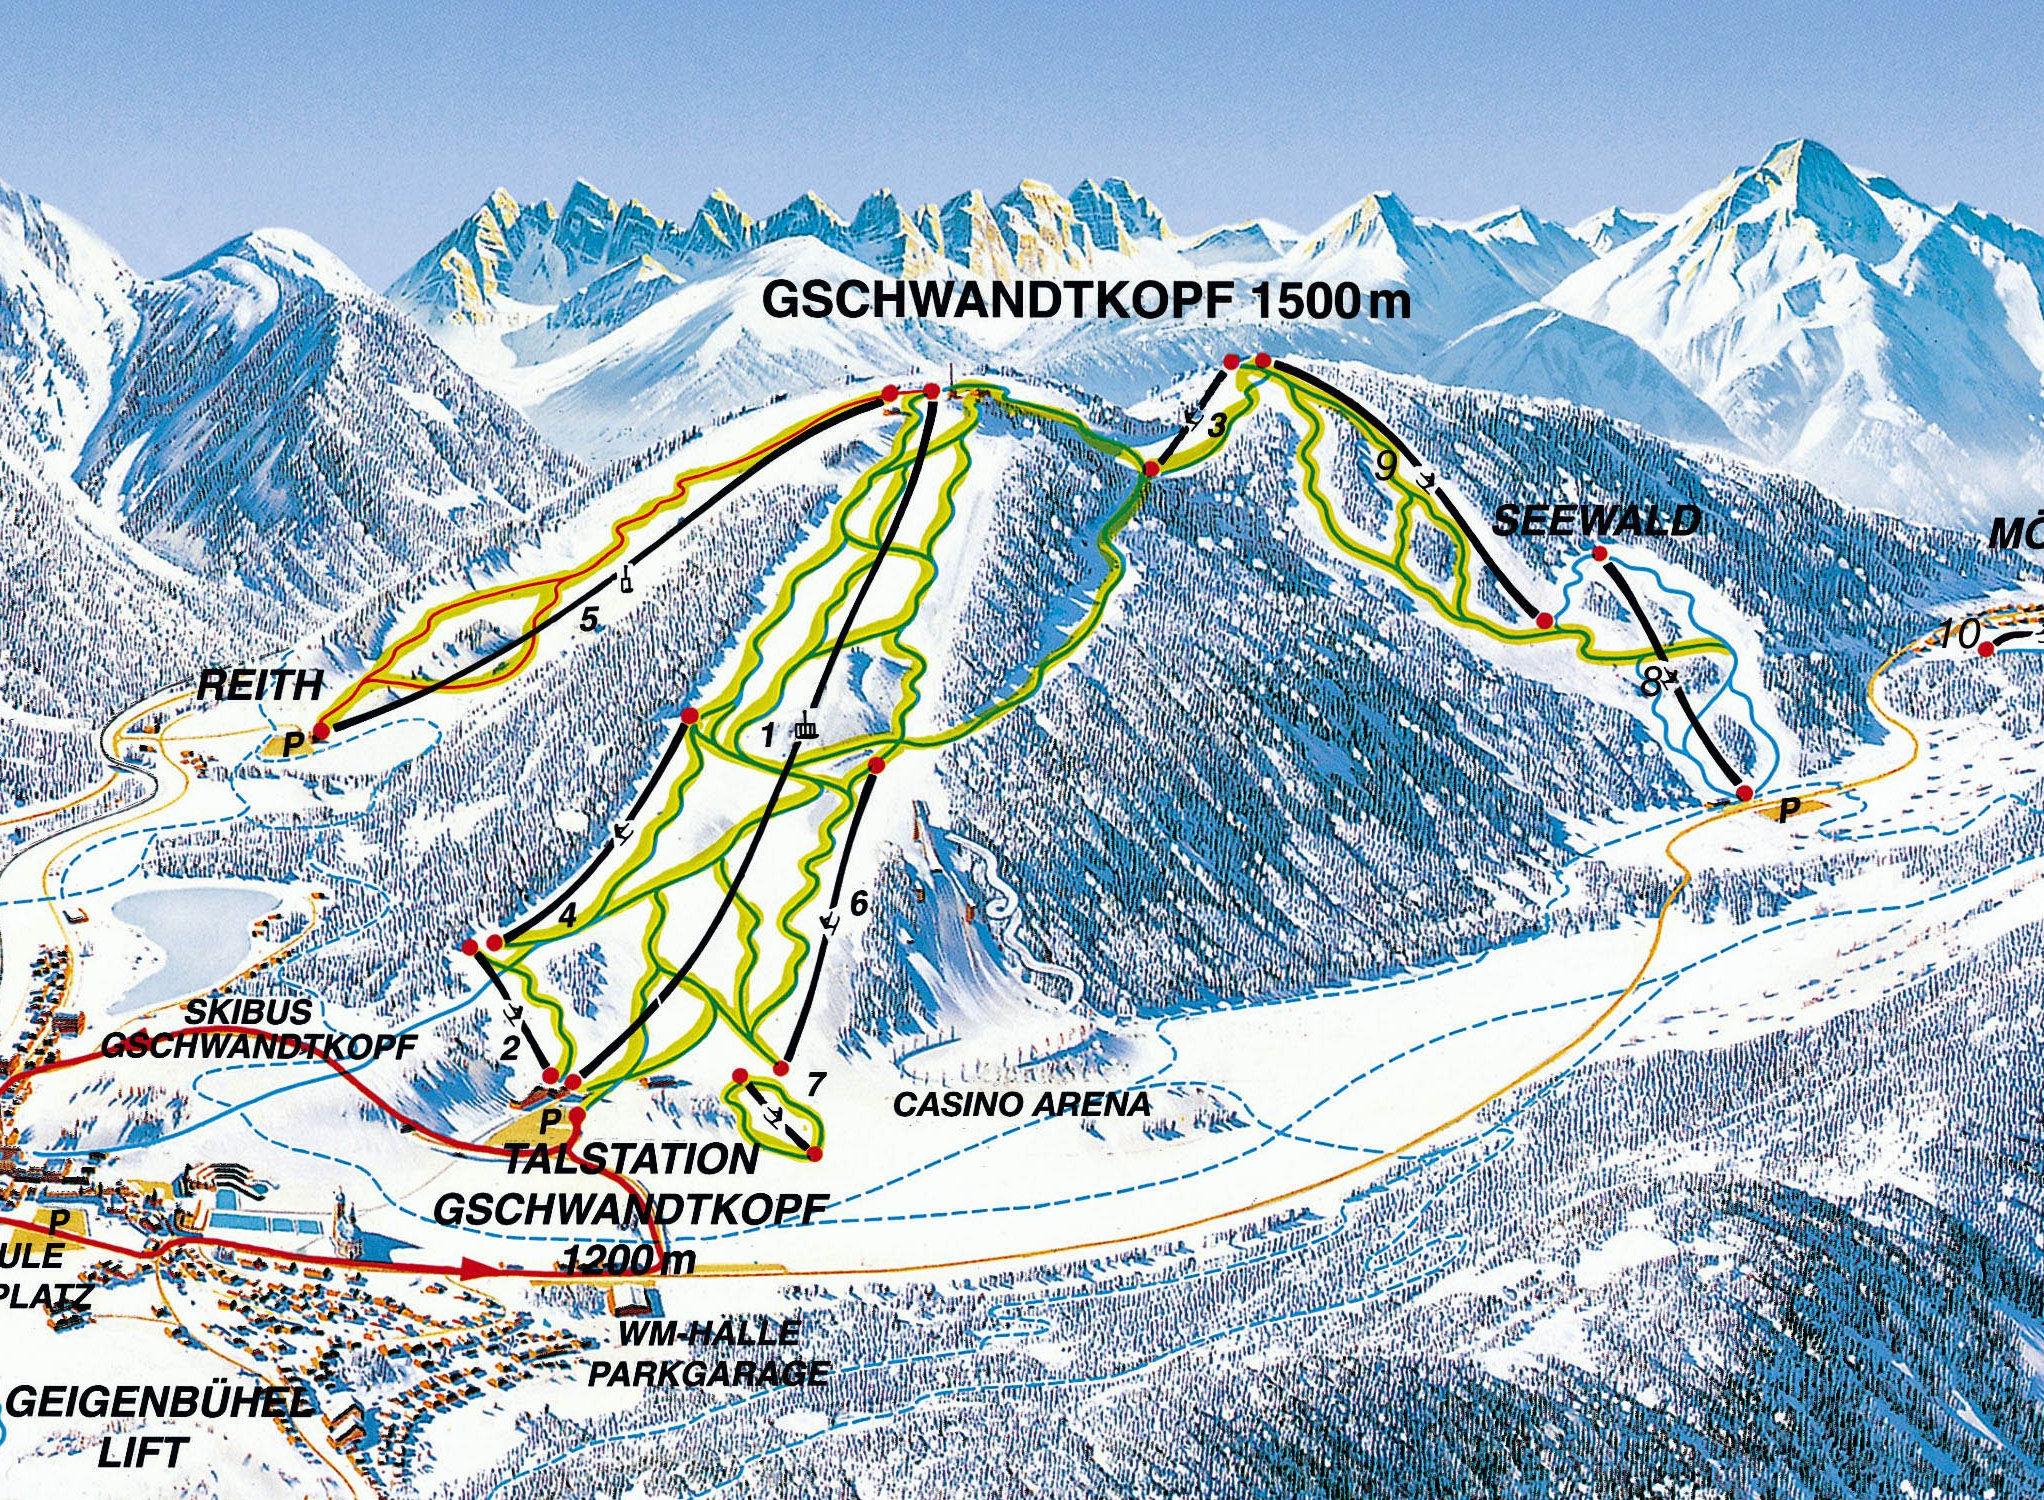 Lyžařská mapa sjezdovek areálu Seefeld - Reith / Gschwandtkopf